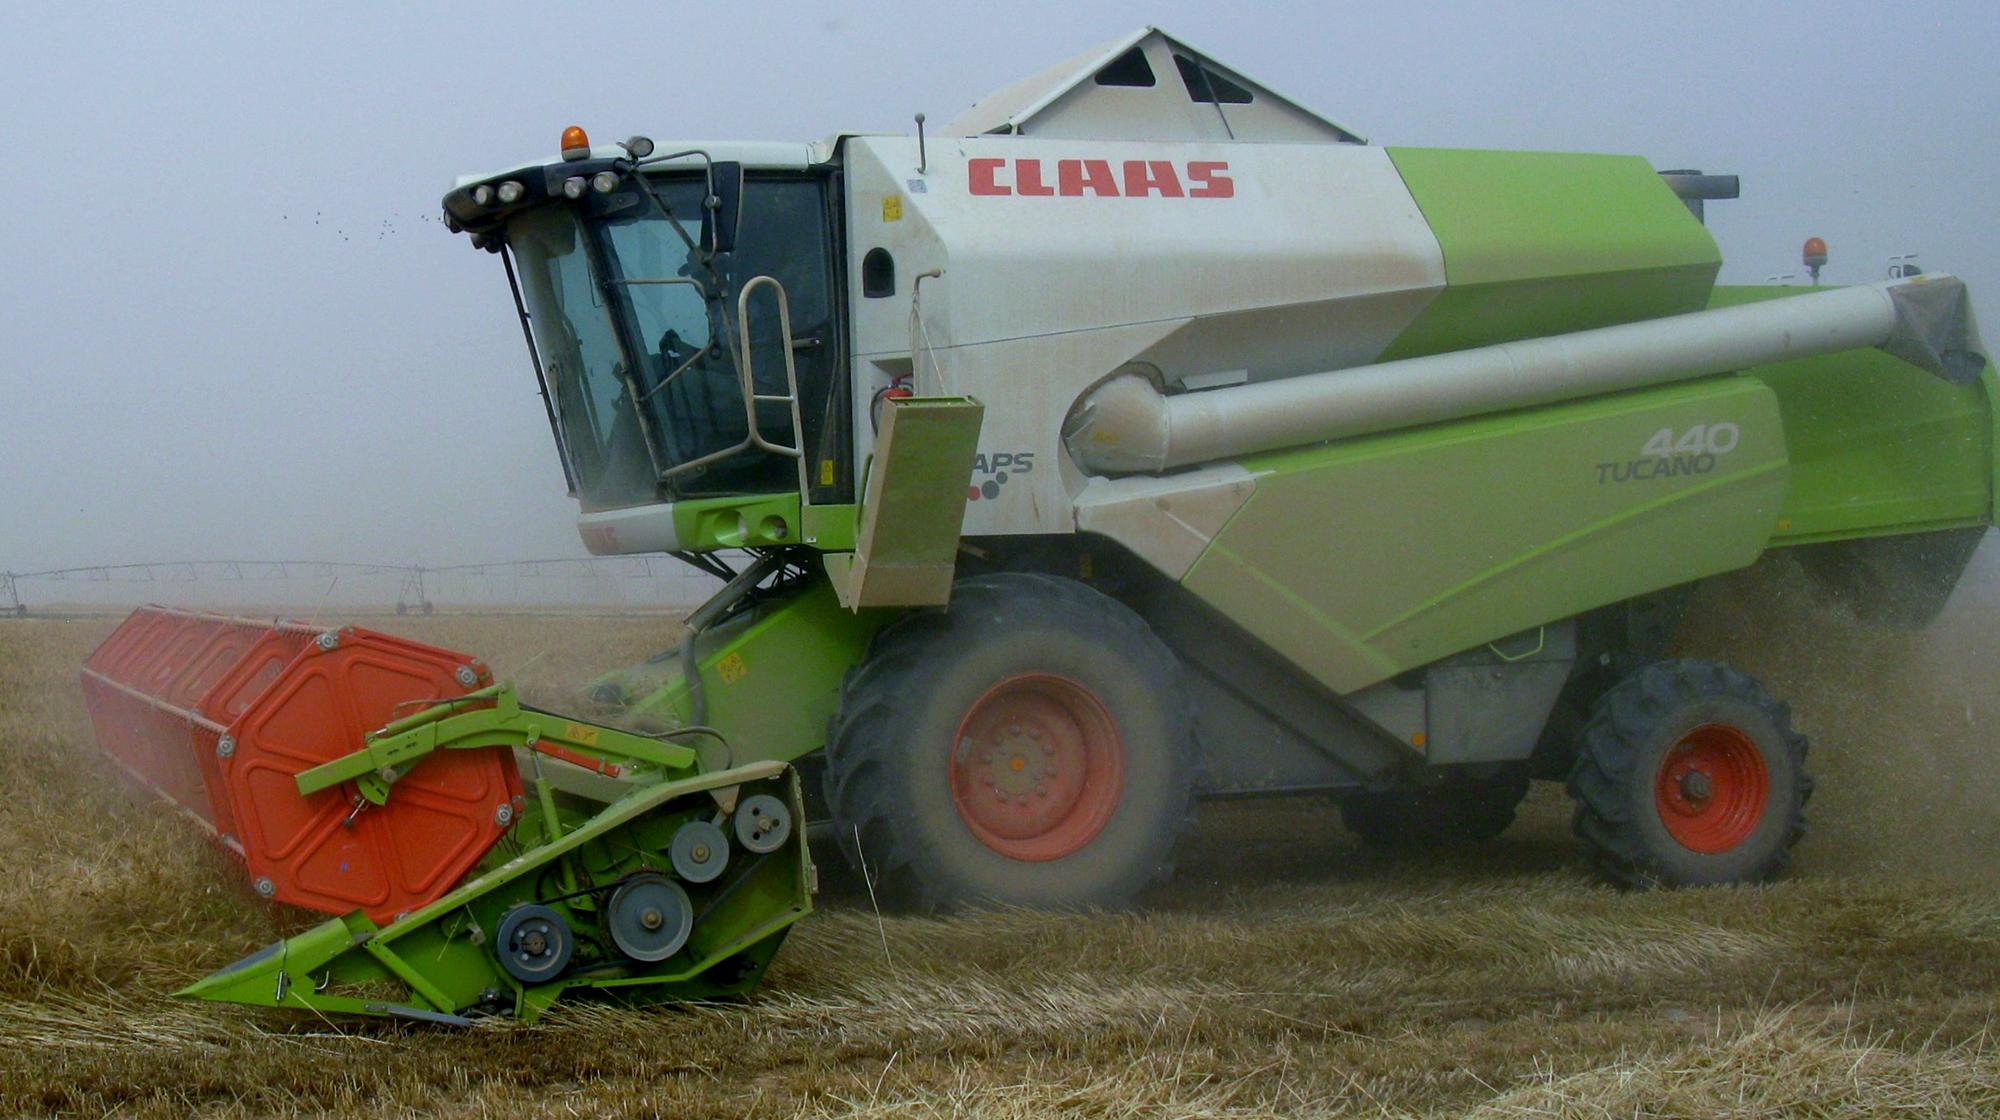 Harvesting Cereals in arid, semi-arid and tropical